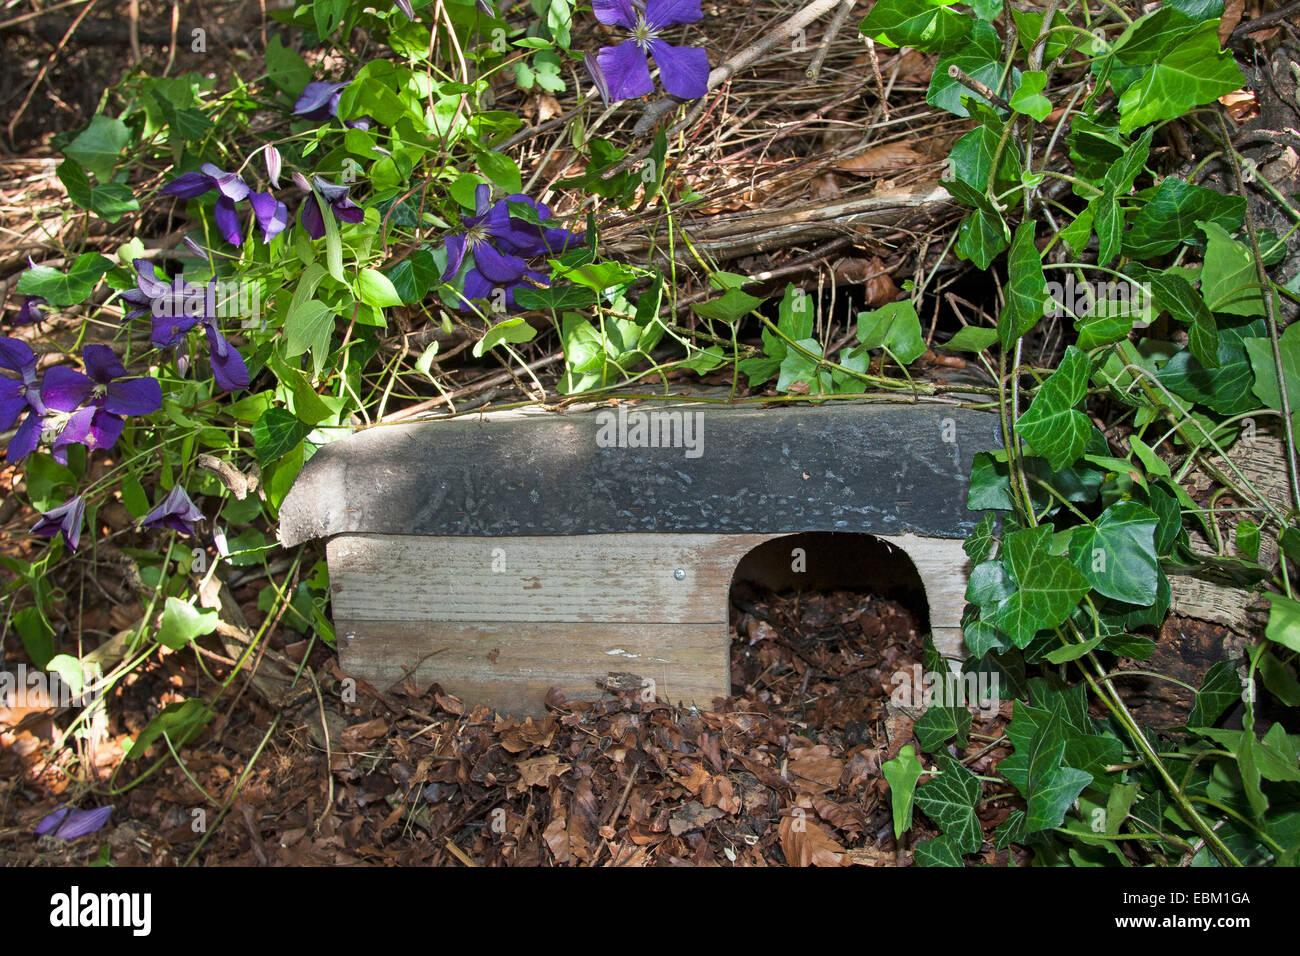 Western hedgehog, European hedgehog (Erinaceus europaeus), shelter for hedgehogs in a natural garden, Germany - Stock Image